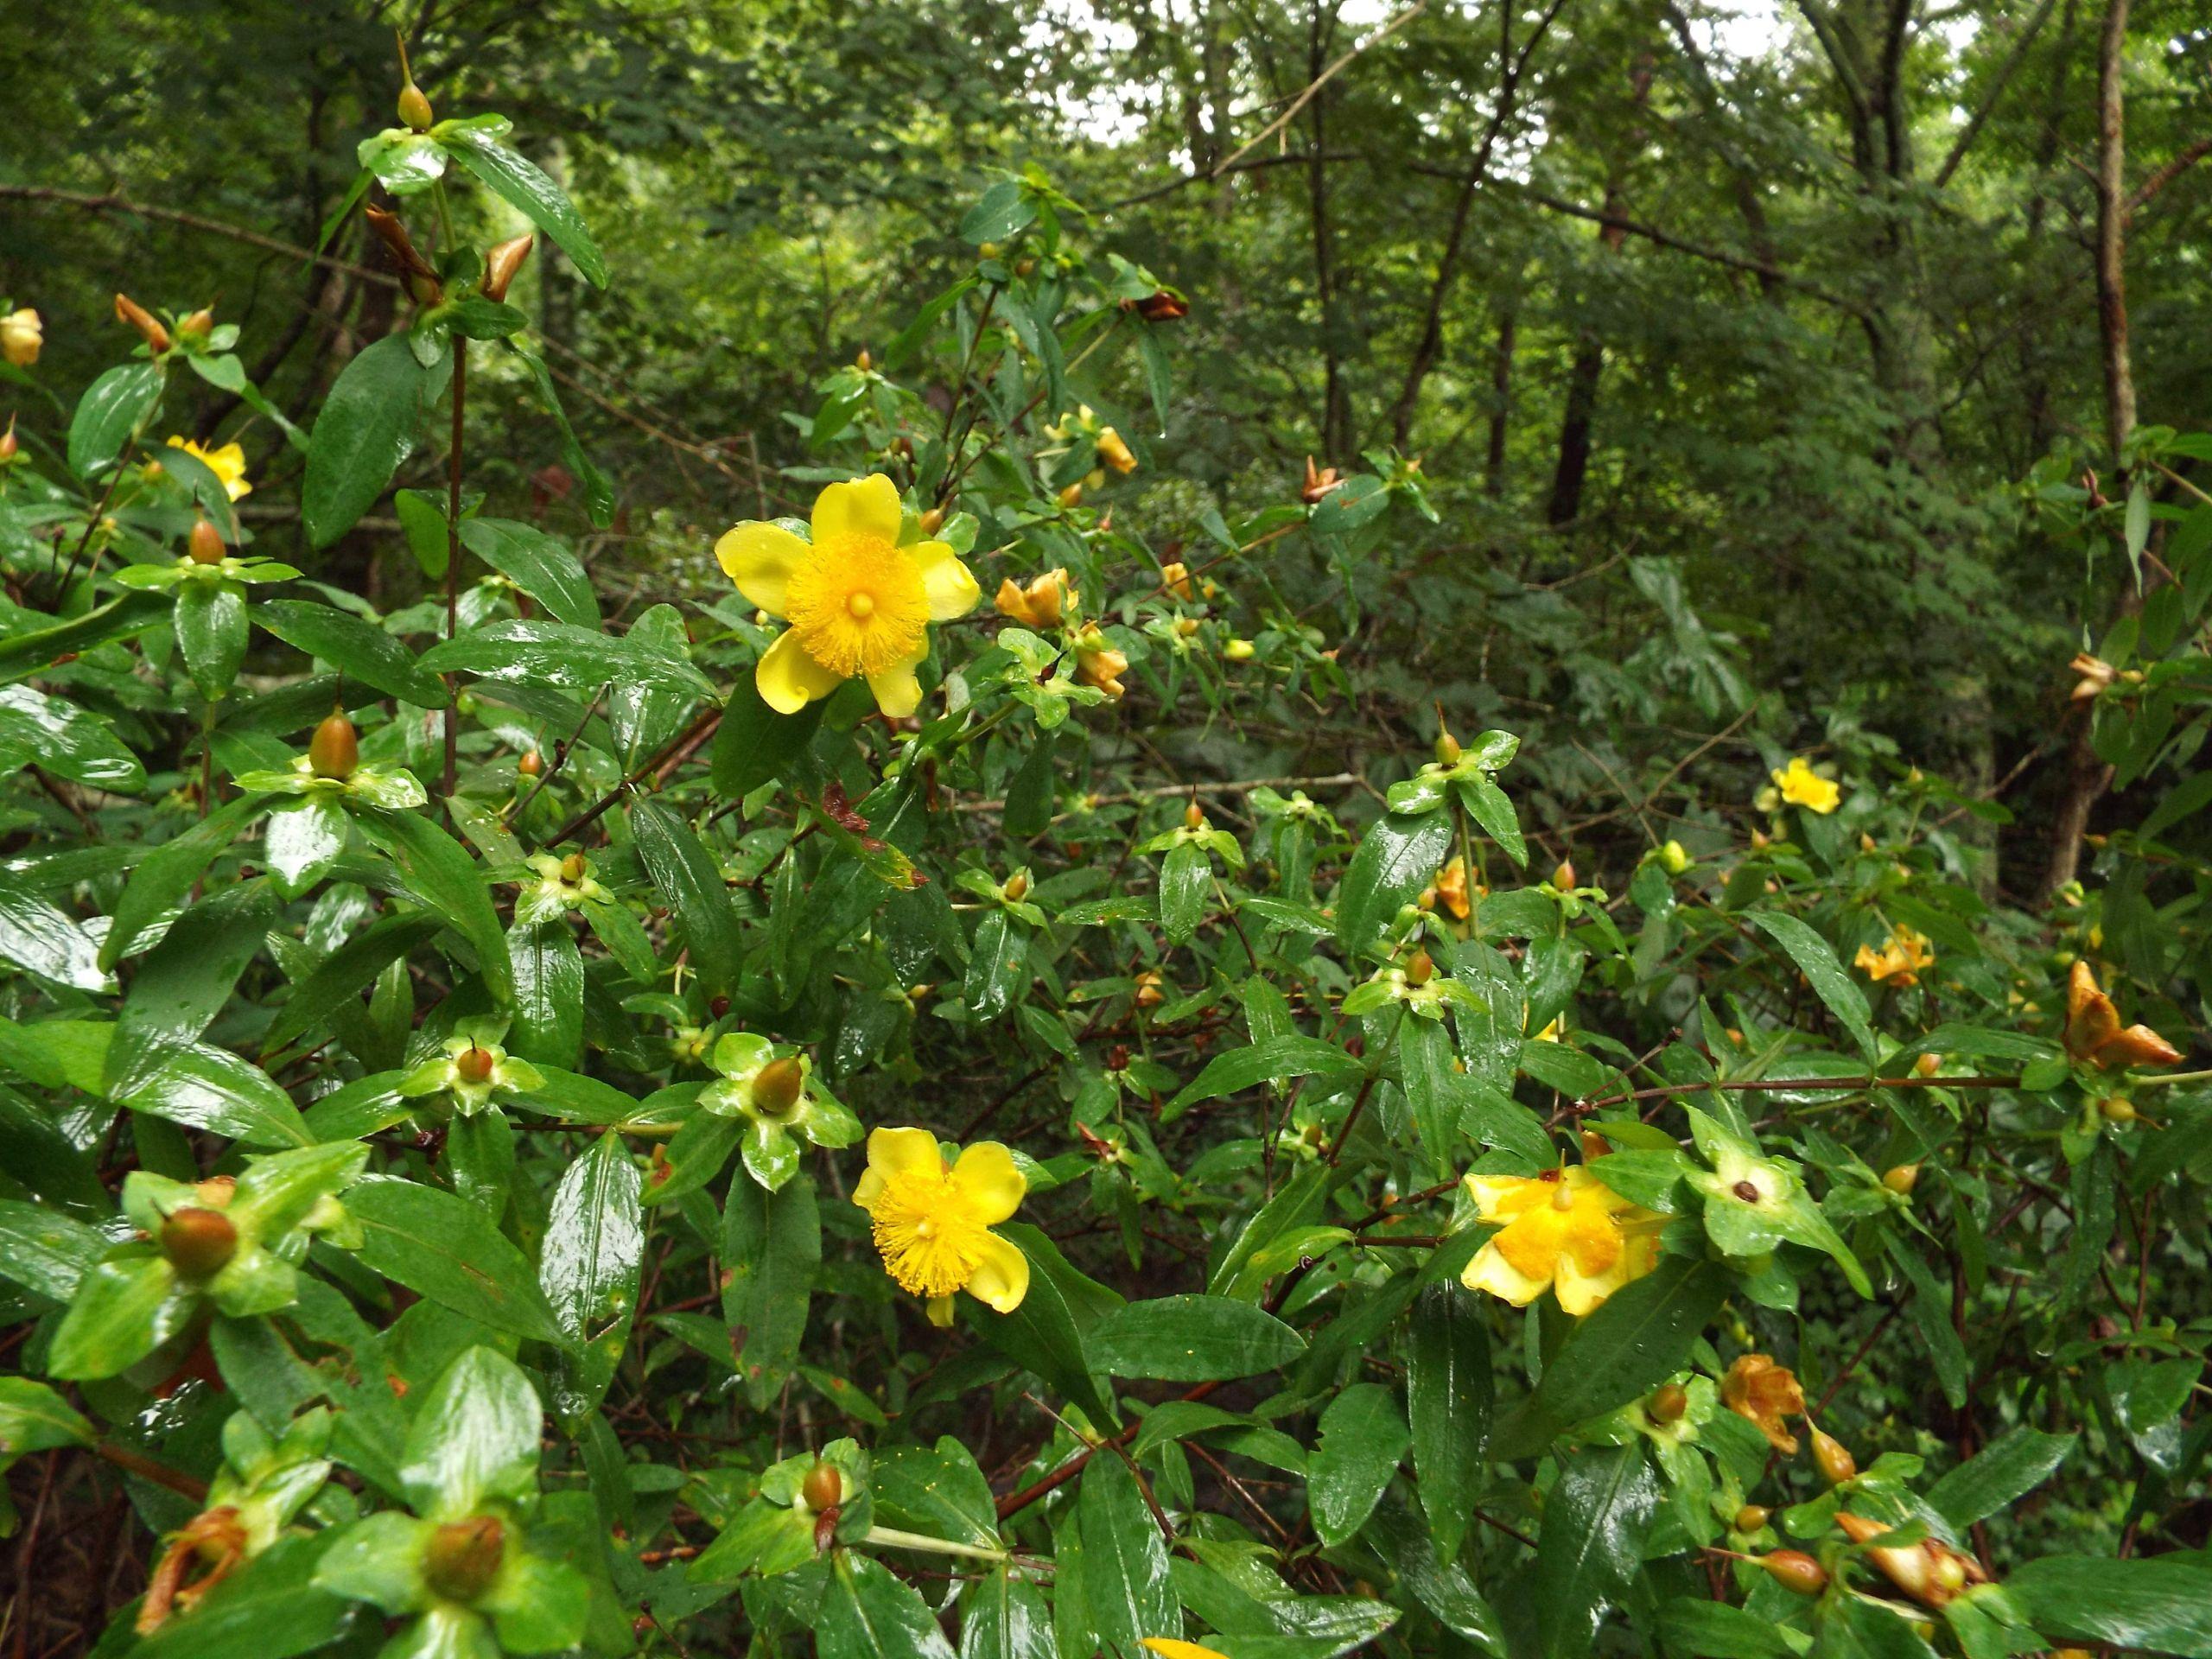 Hypericum frondosum Cedar glade st johnswort JPG